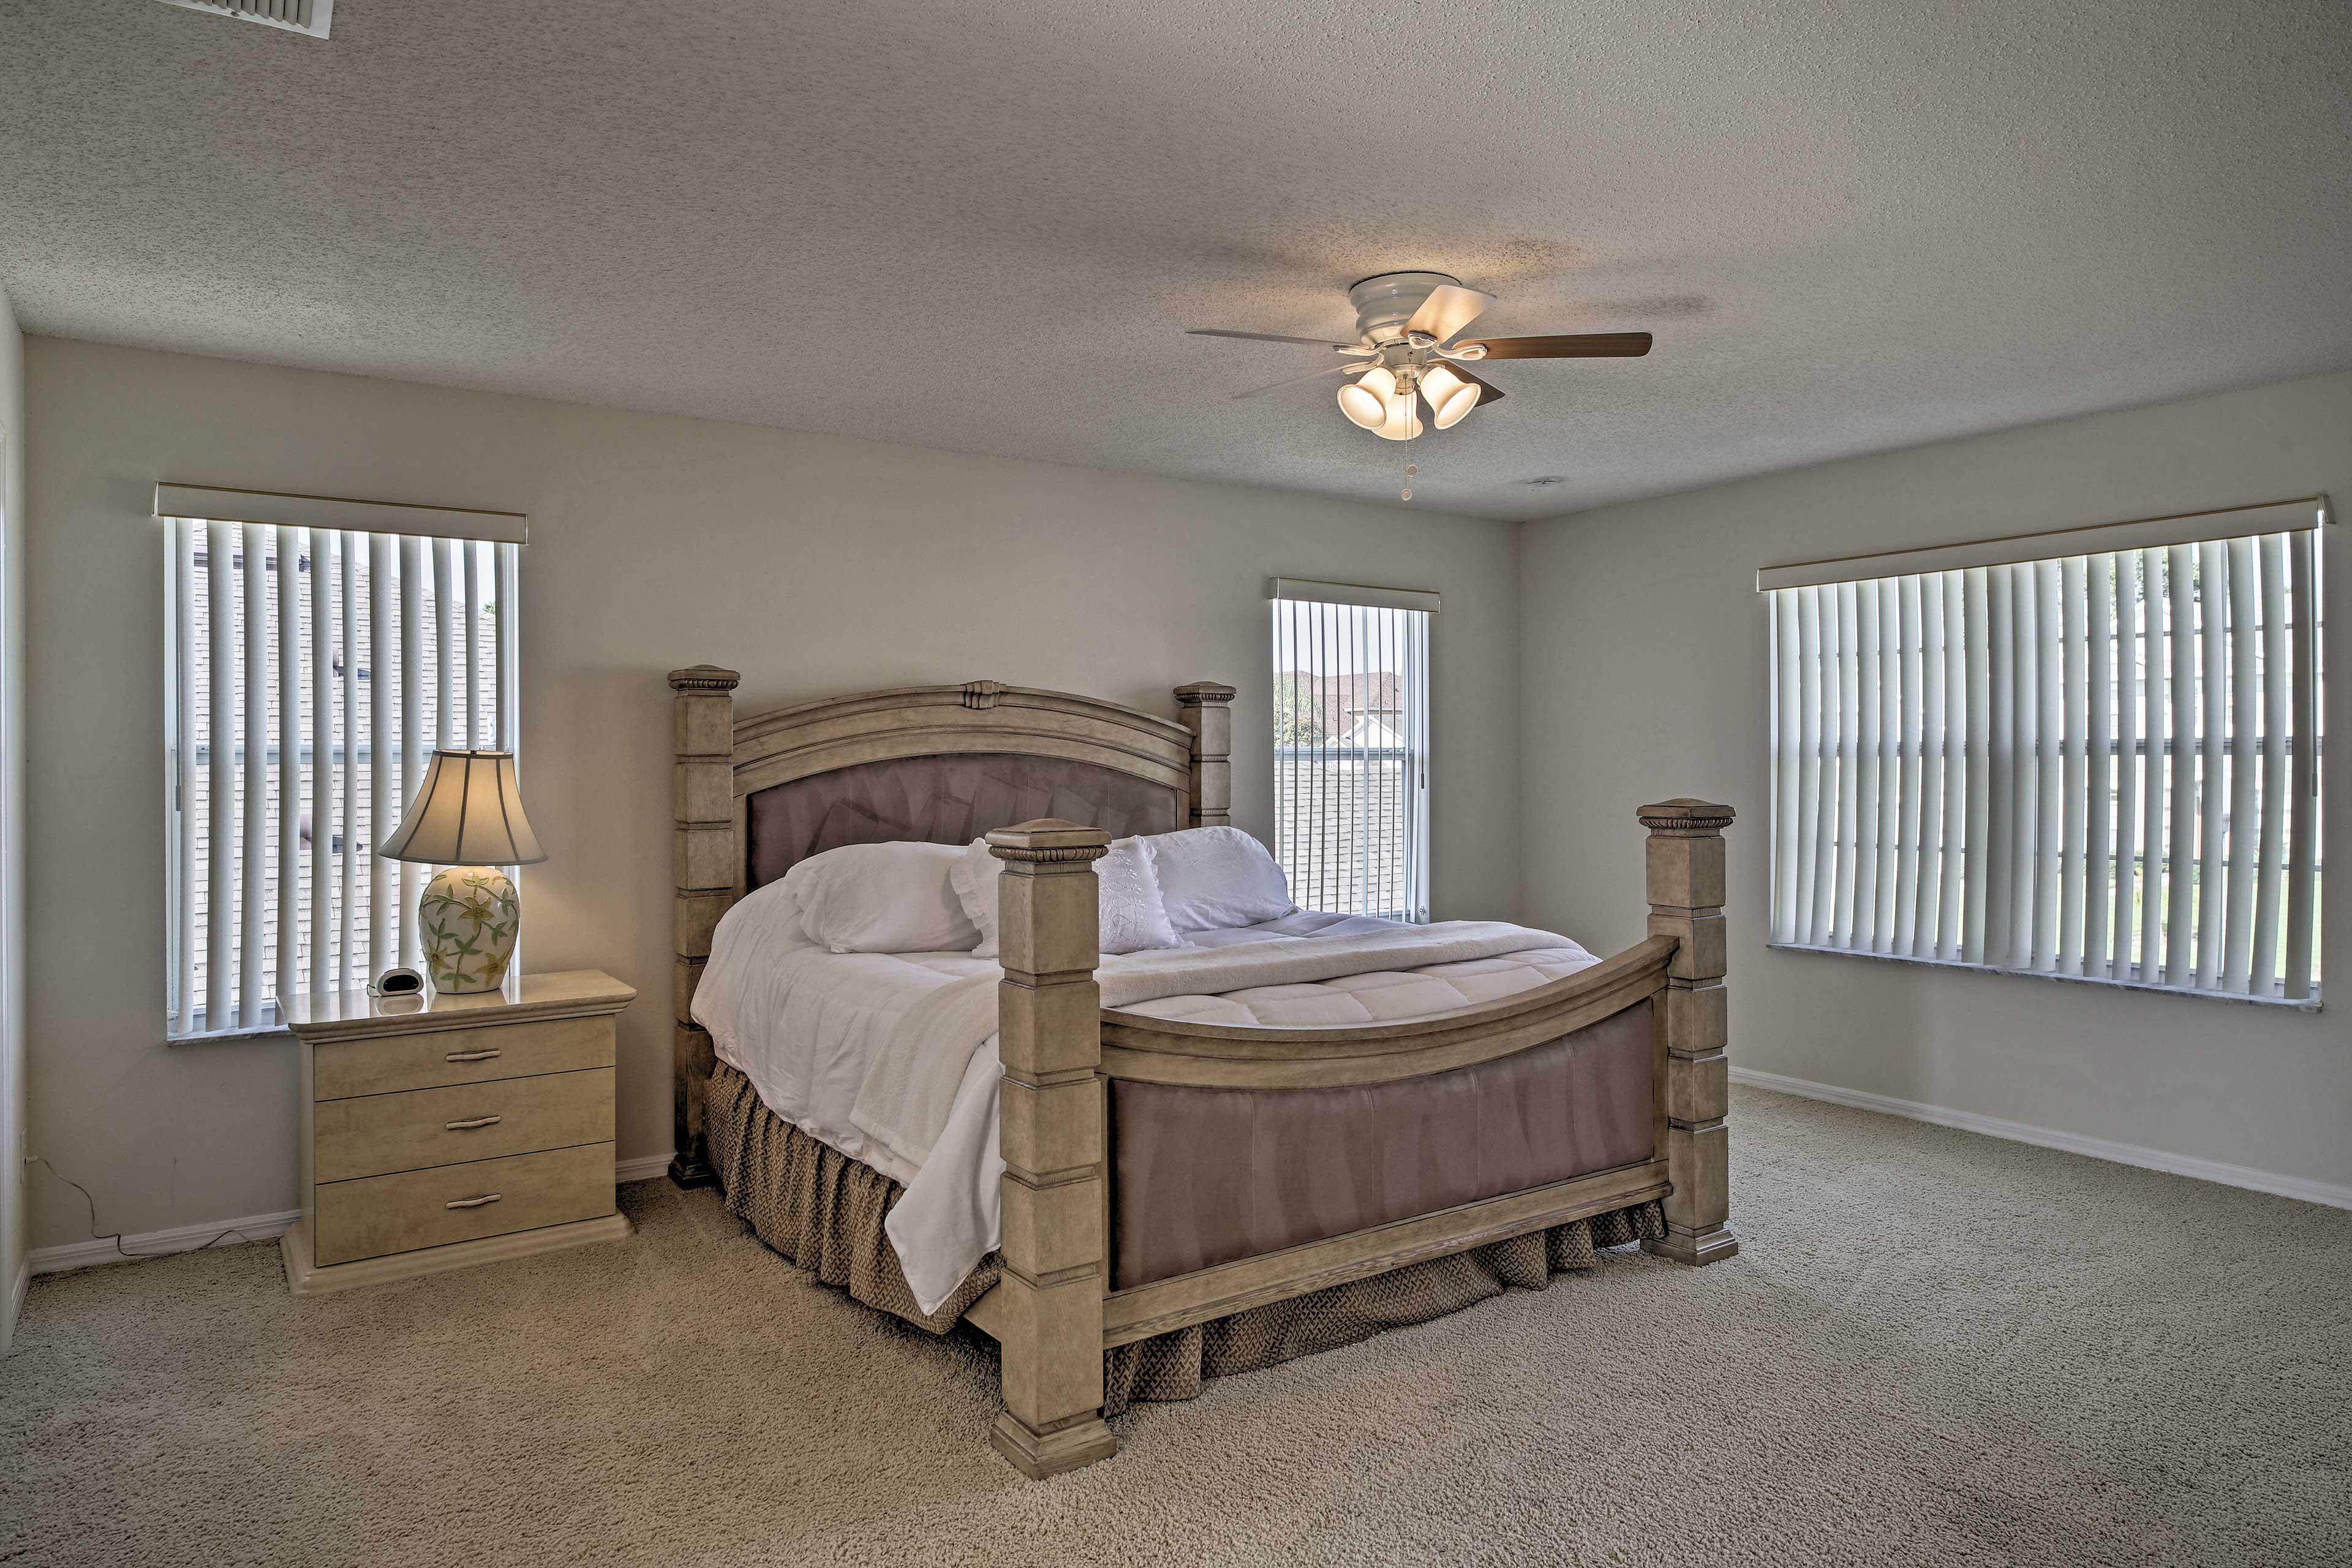 The master bedroom king bed sleeps 2.